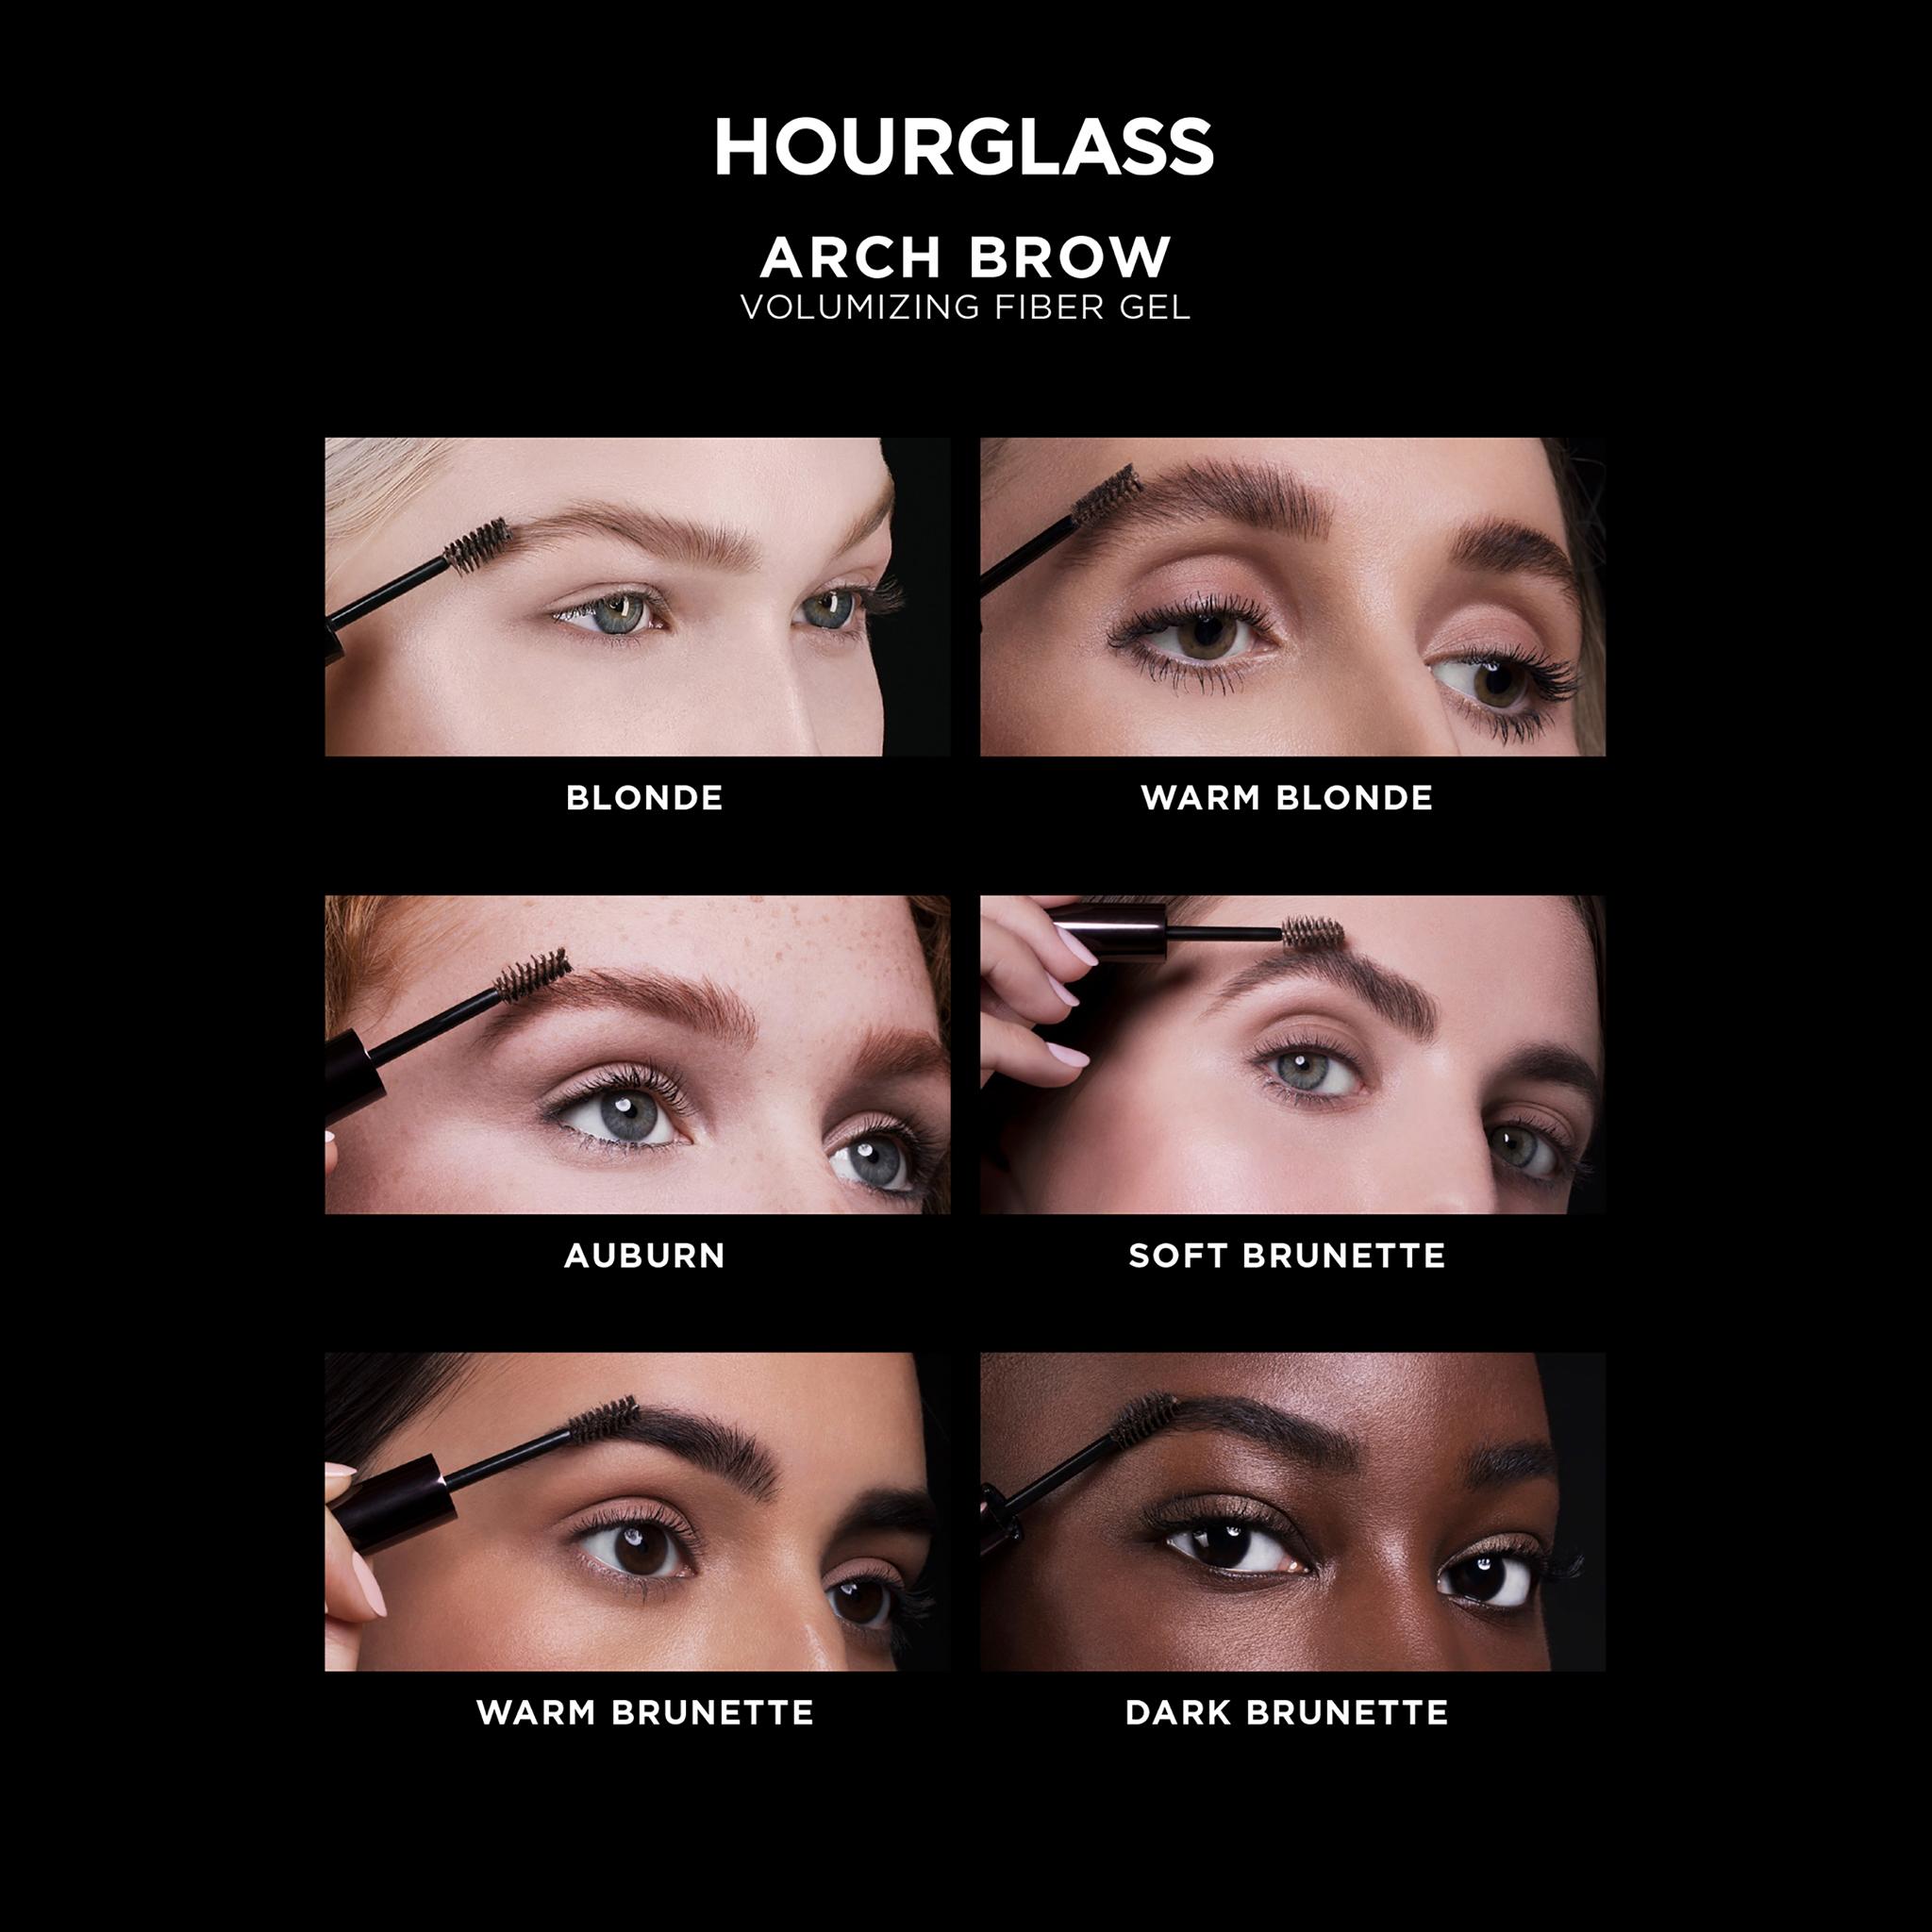 Hourglass Arch Brow Volumizing Fiber Gel Spacenk Gbp